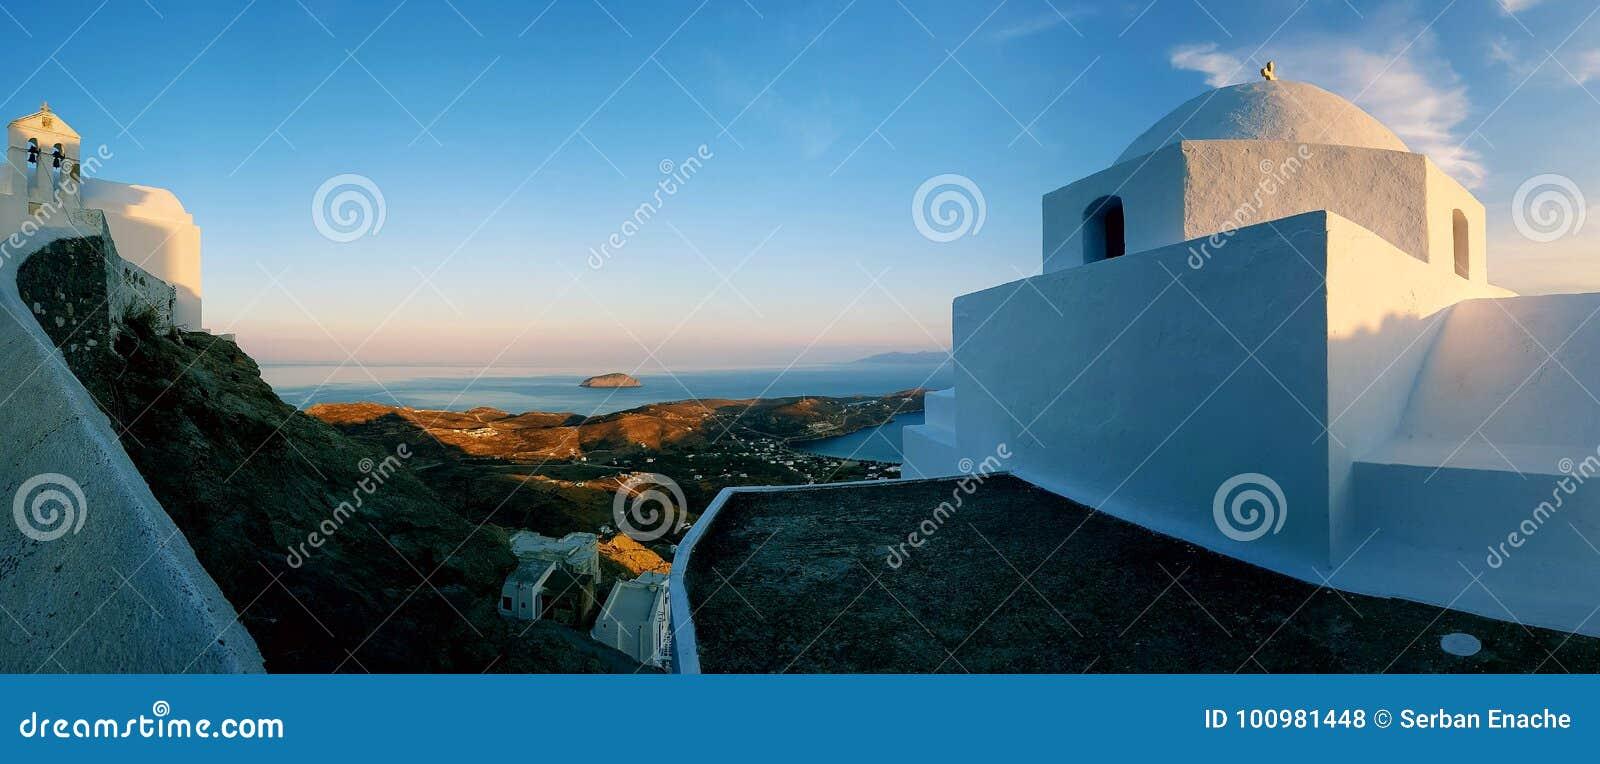 Arquitetura de Cyclades na ilha de Serifos